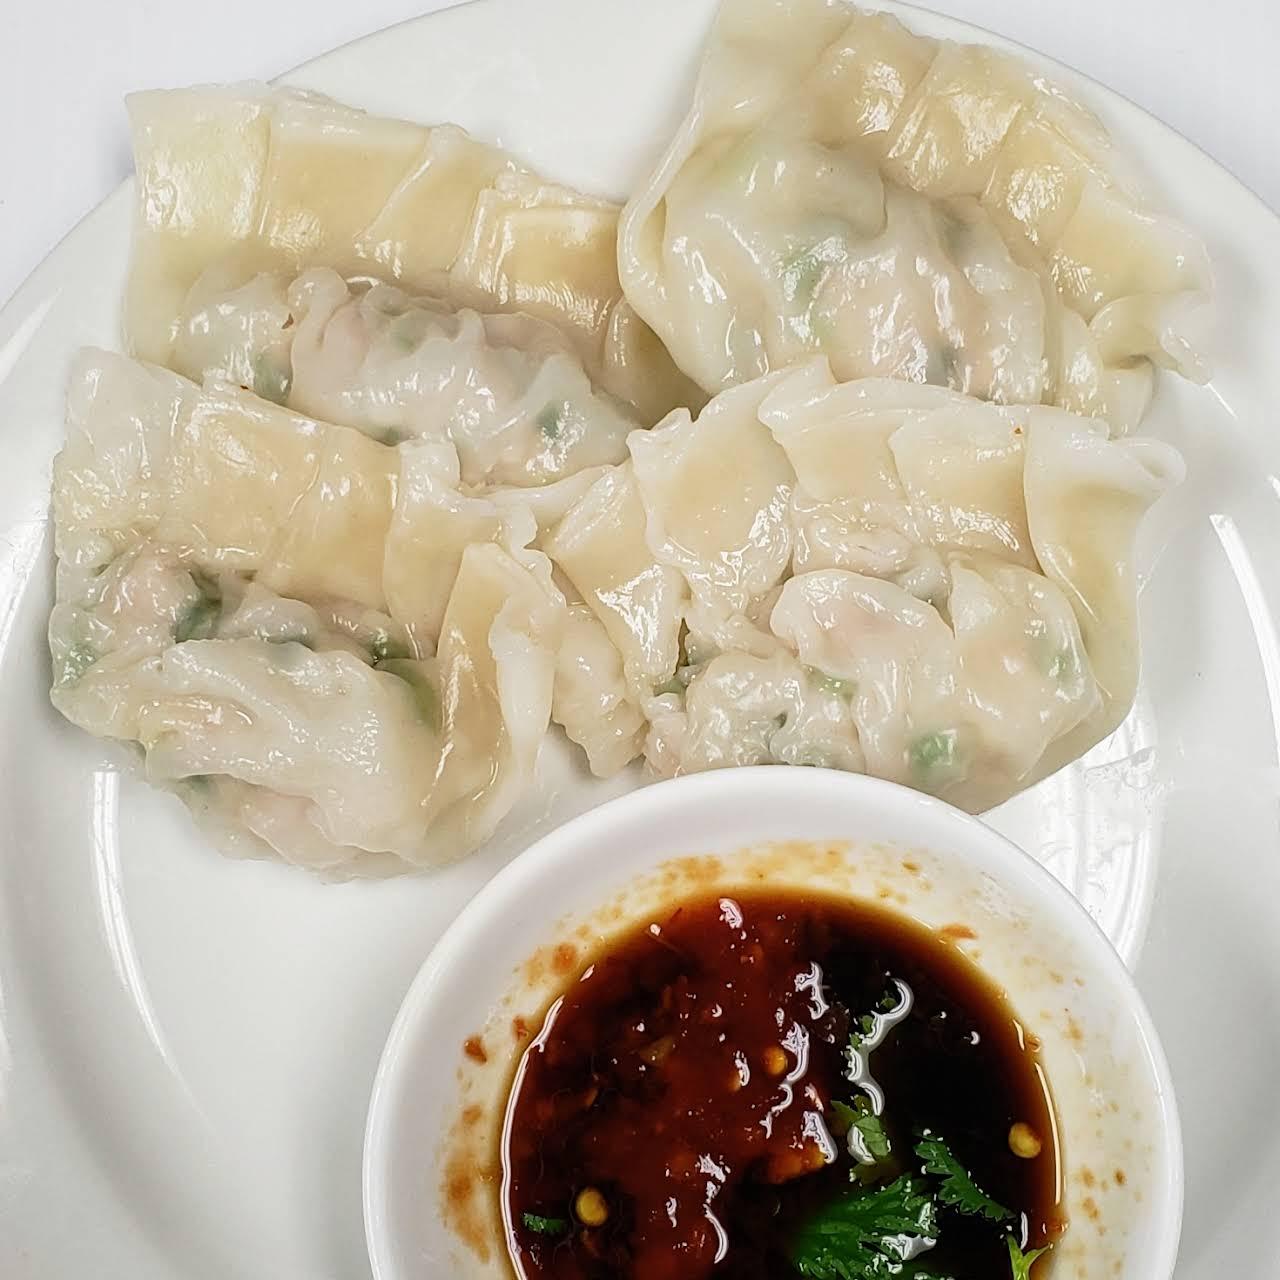 Pho 95 Vietnamese cuisine - Restaurant in Cocoa